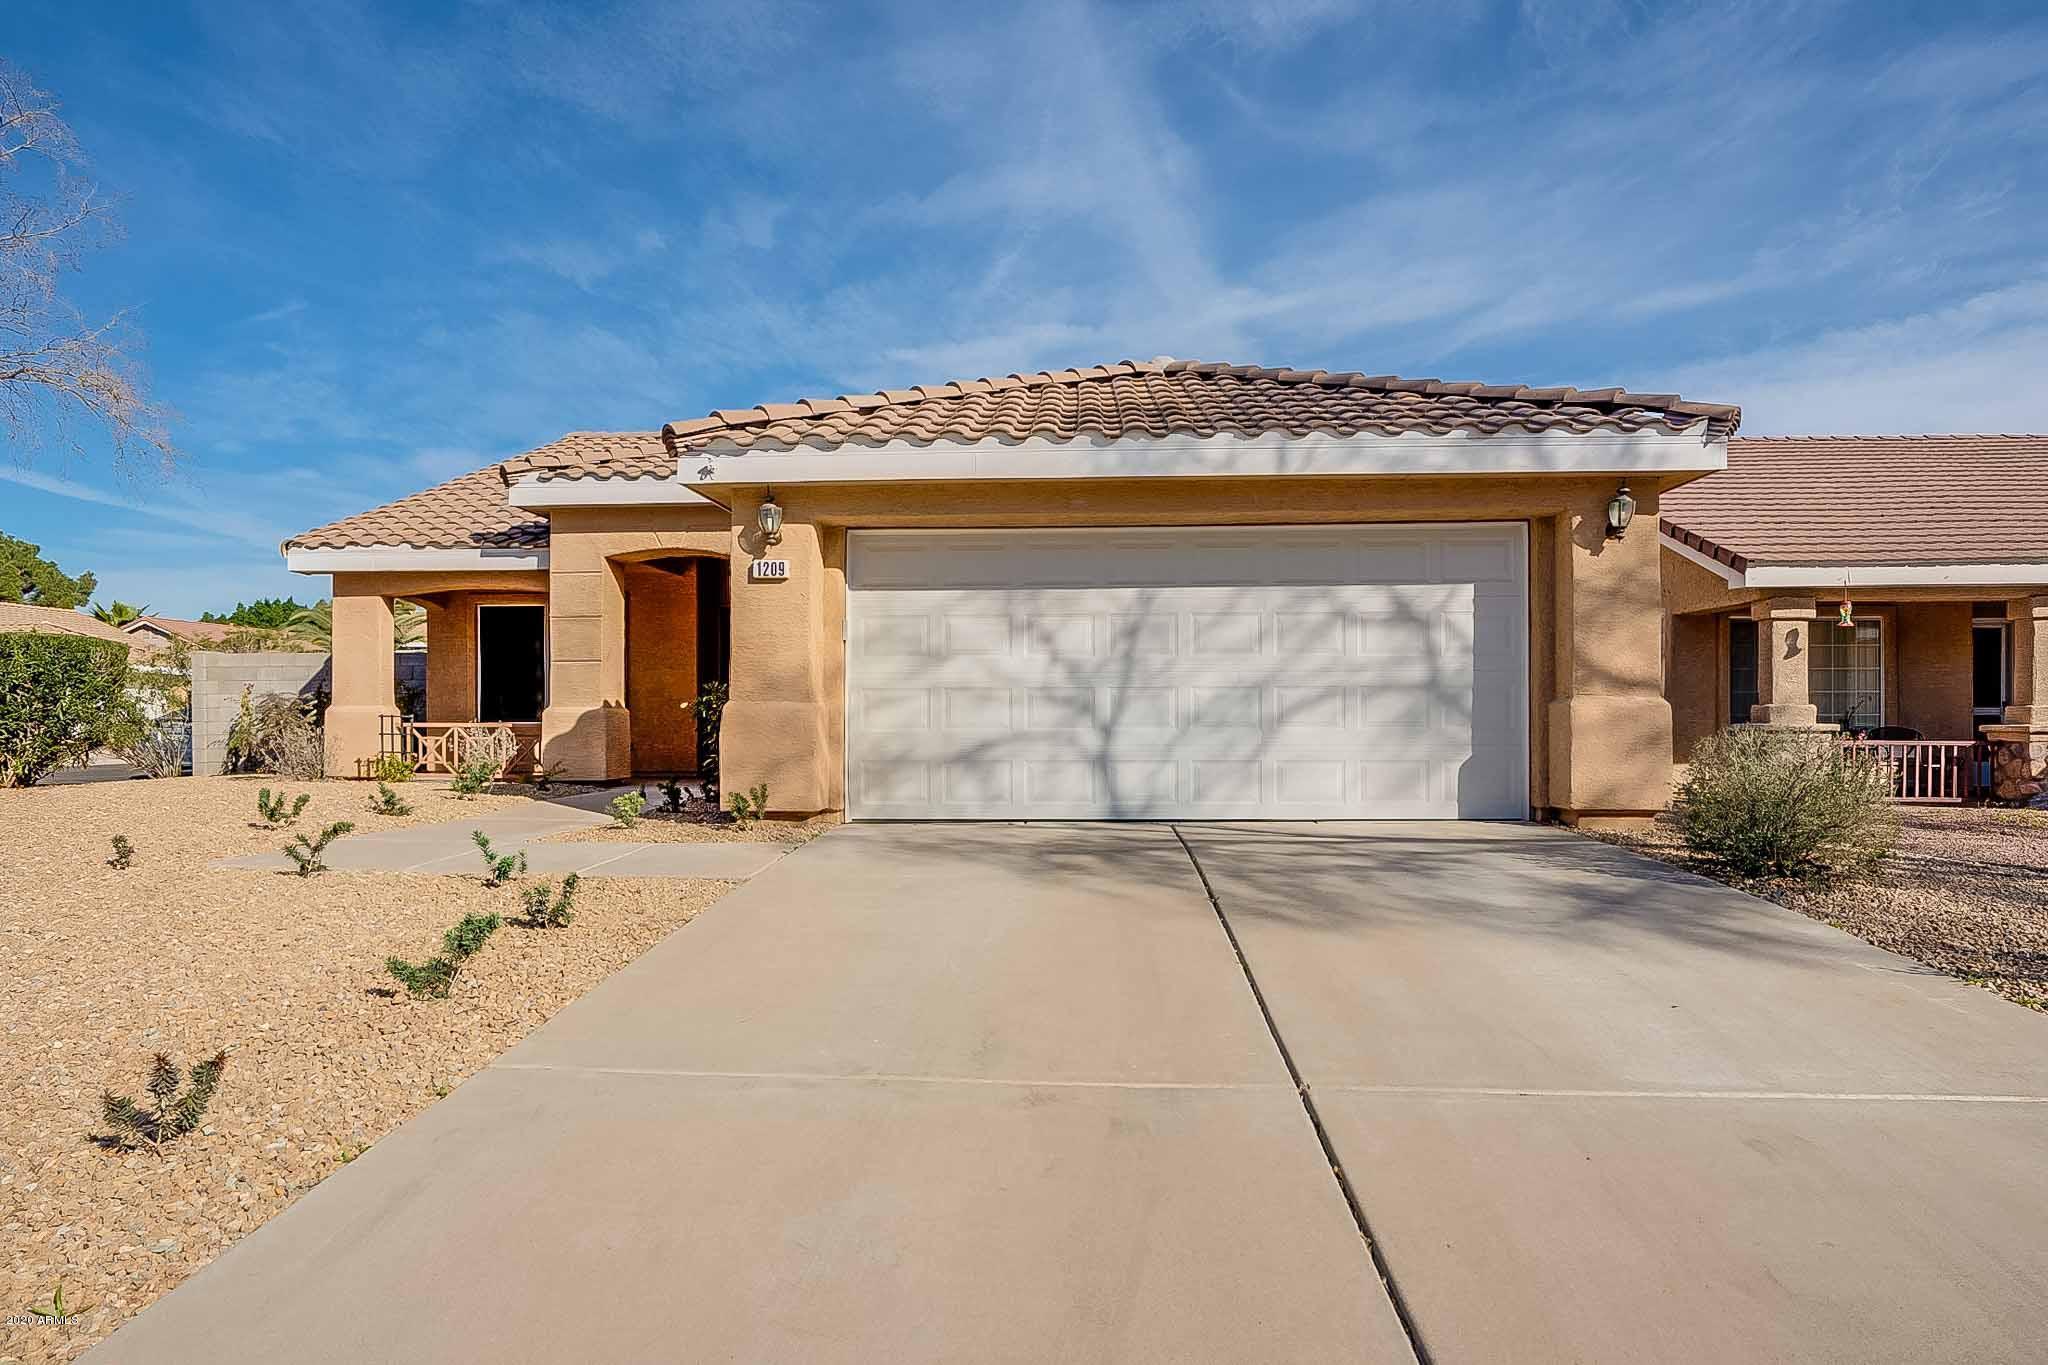 Photo of 1209 N CHARLES Street, Gilbert, AZ 85233